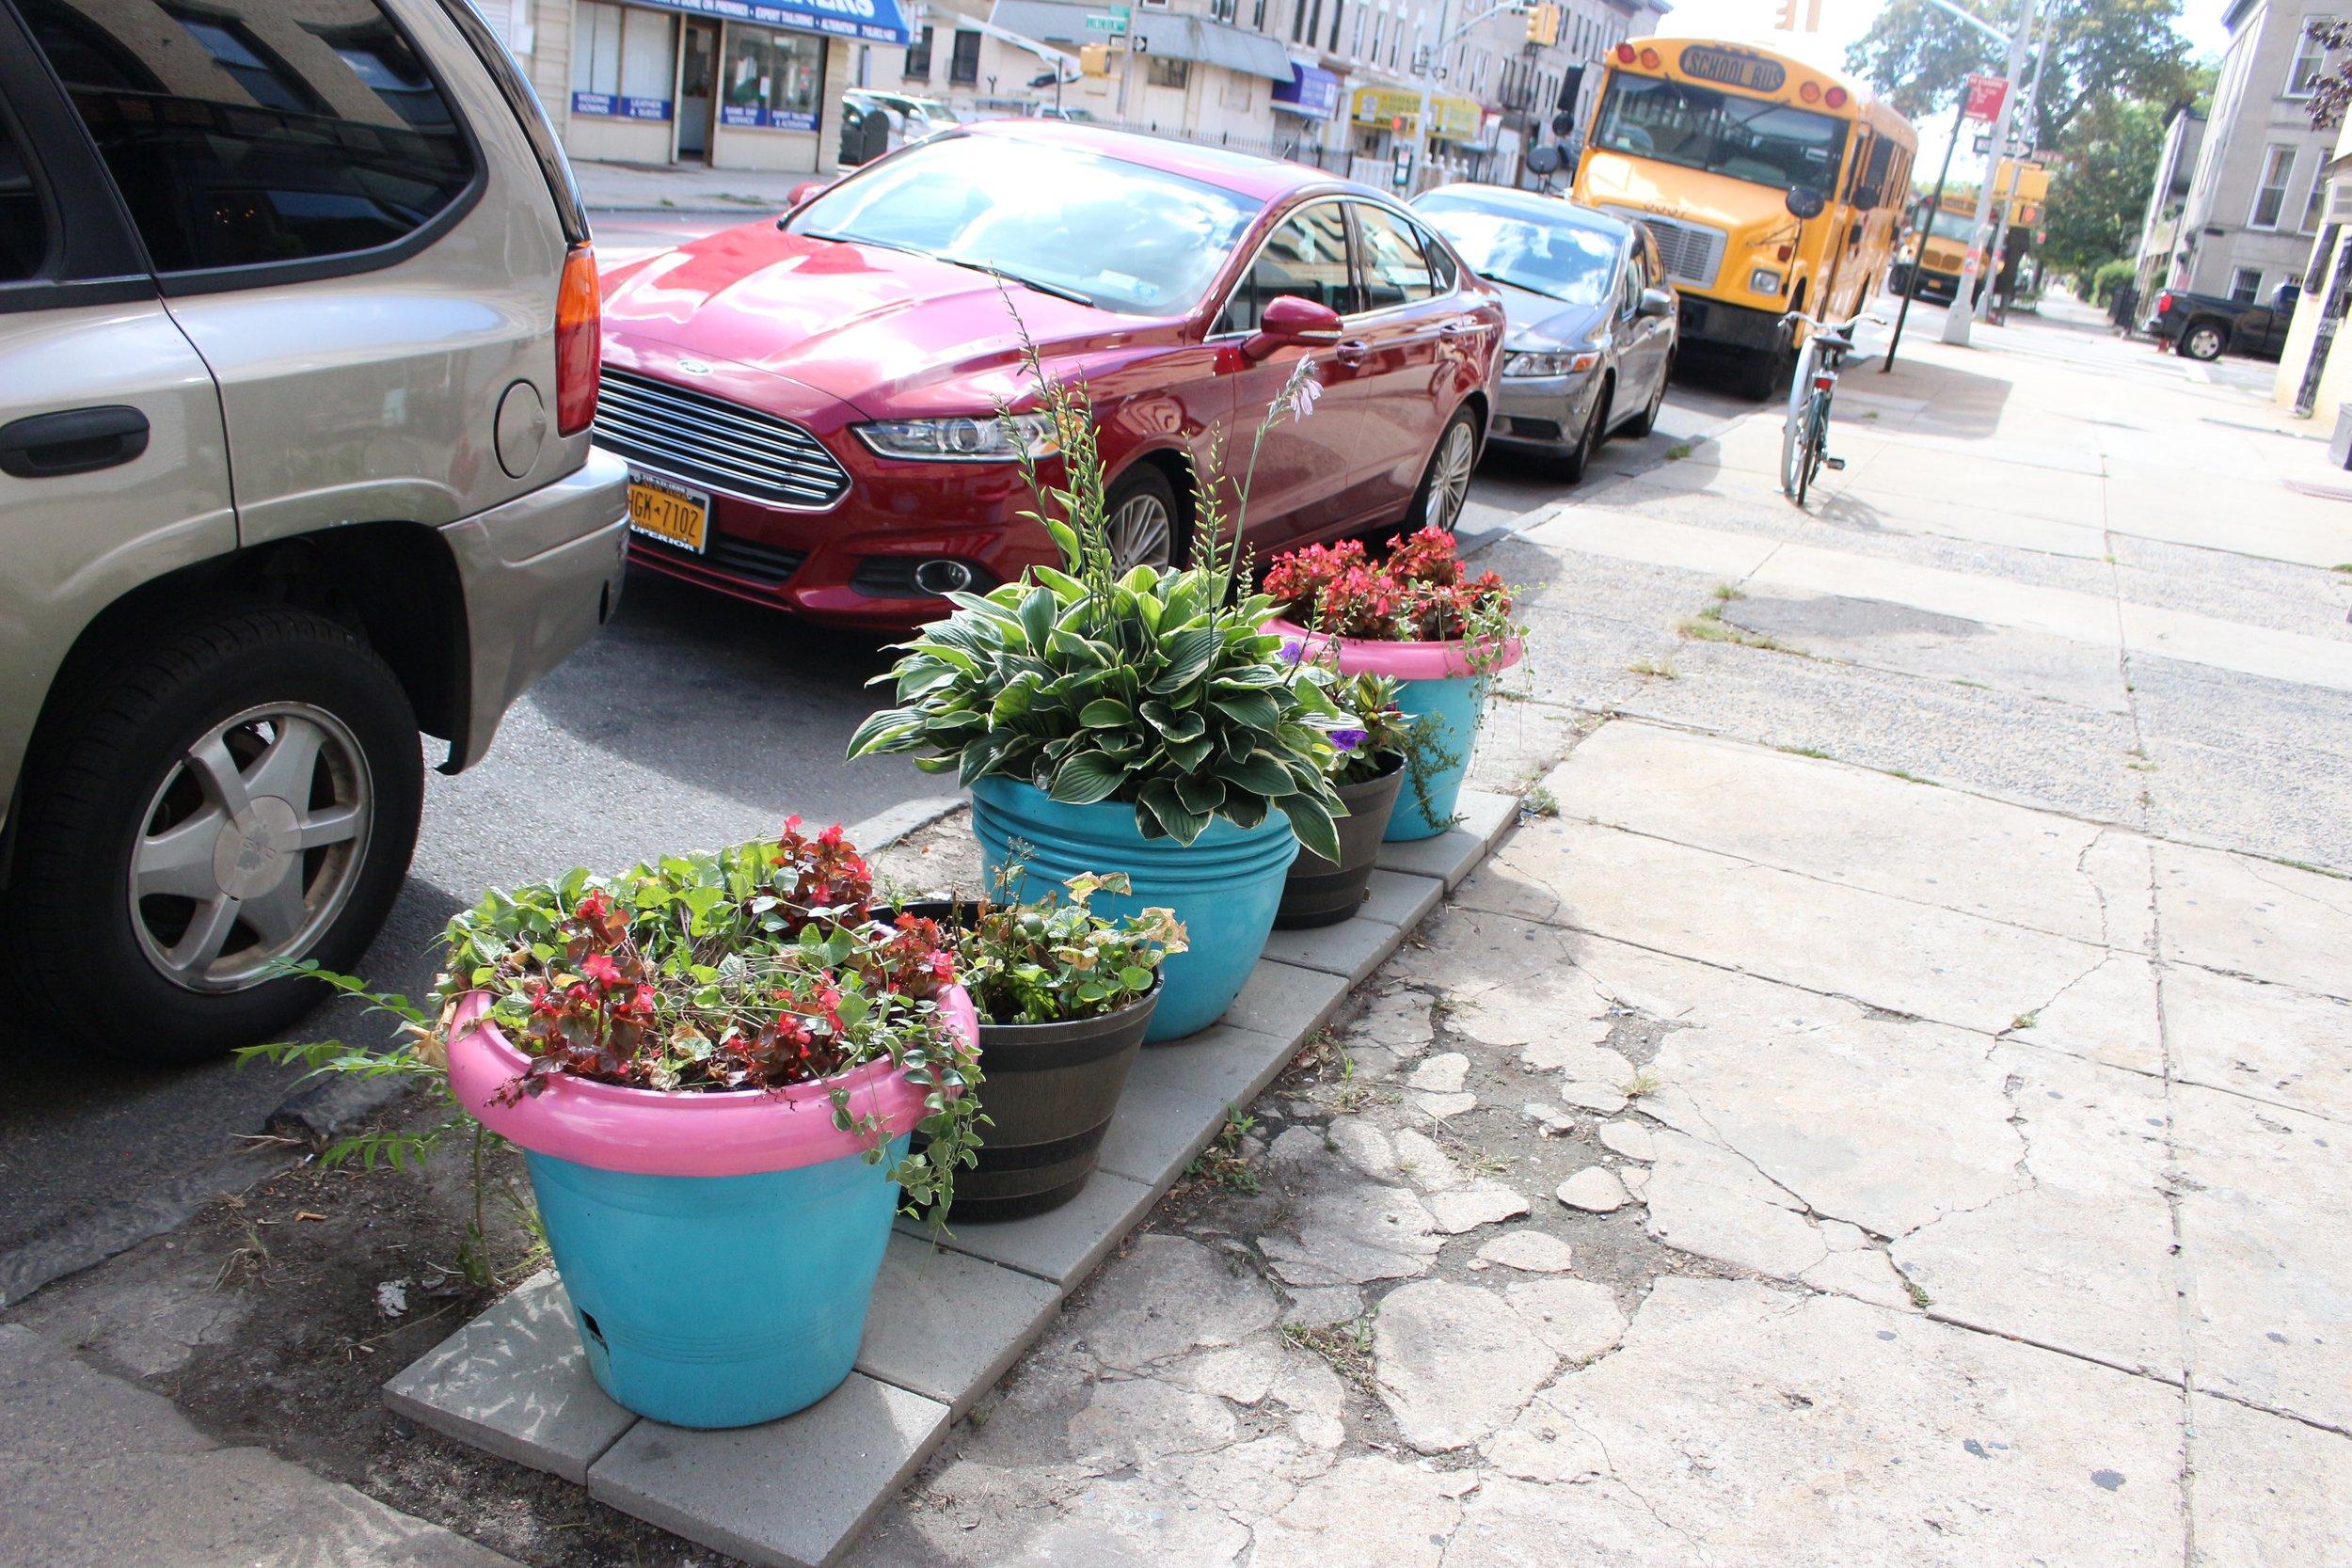 jasmine diane travels to brooklyn, new york